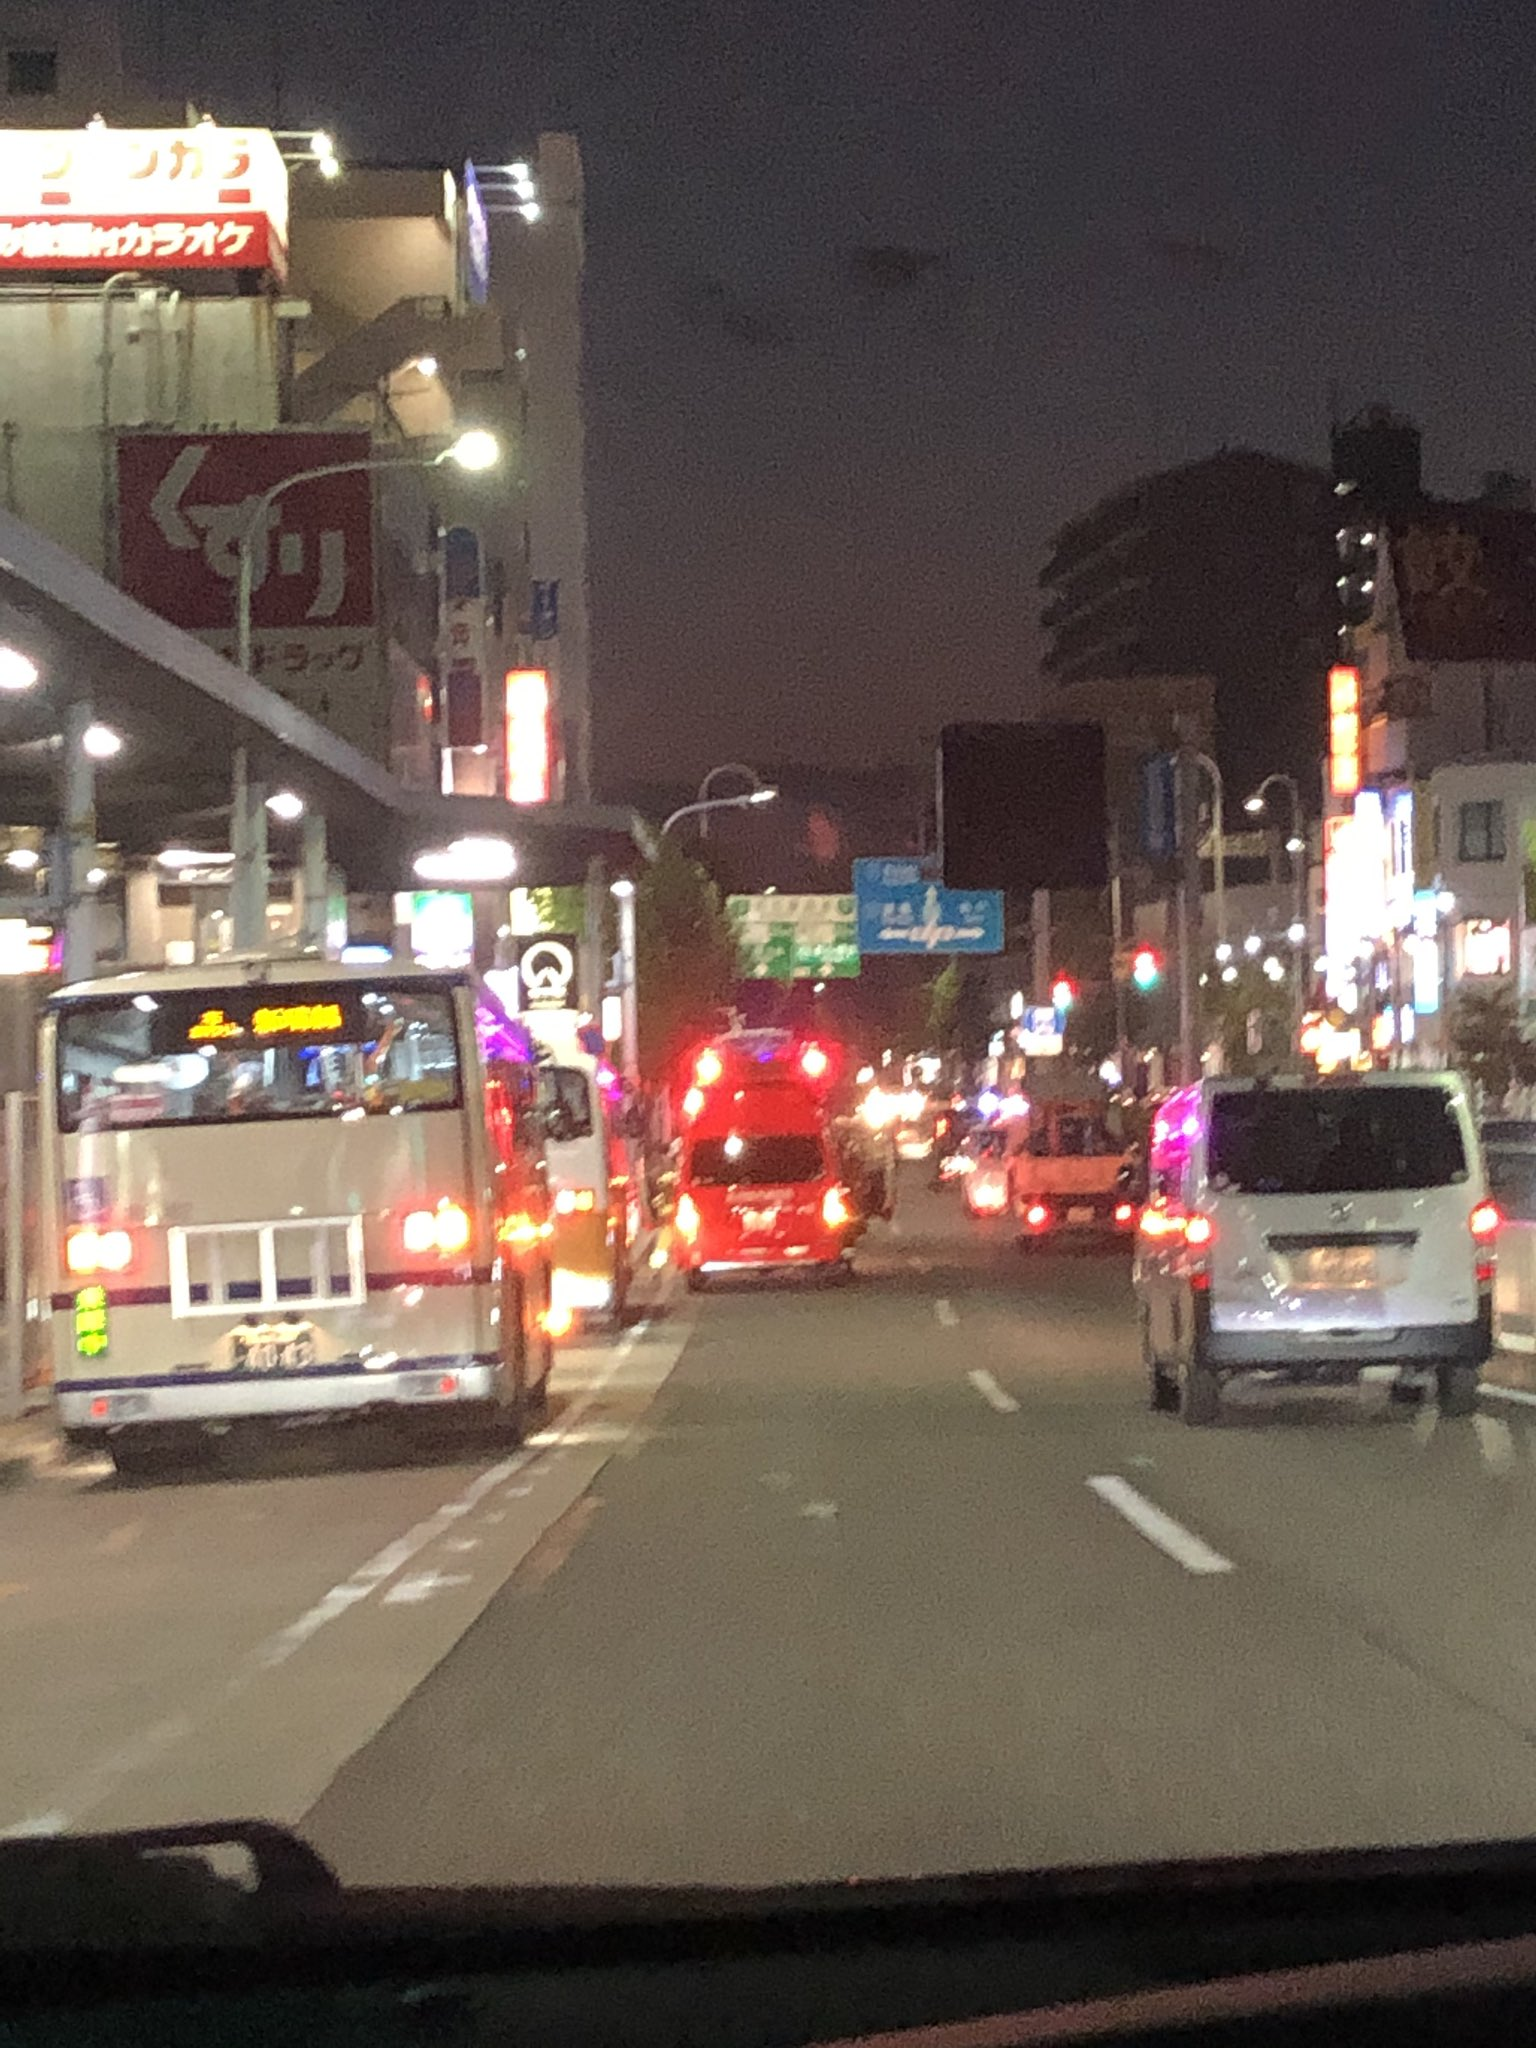 画像,新瑞橋駅火事? https://t.co/YfWy7plvjd。